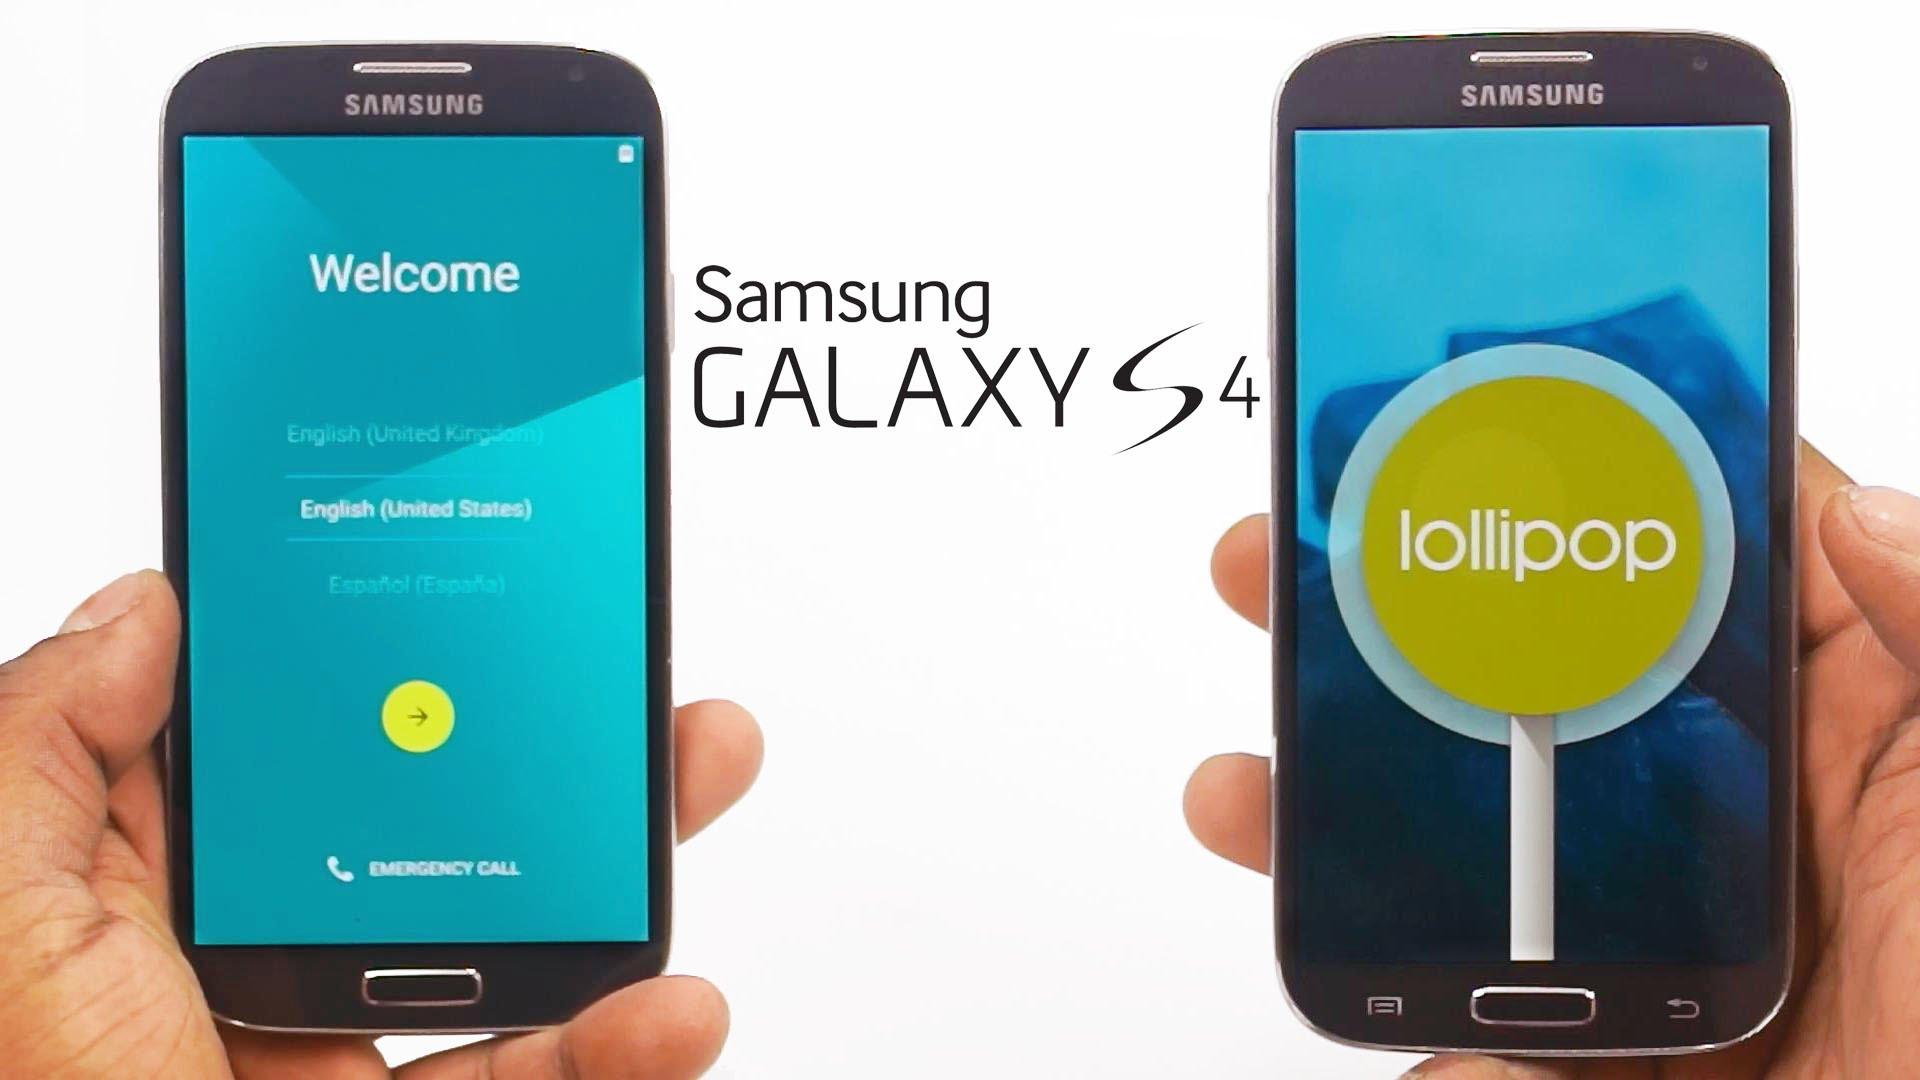 Samsung Galaxy S4 Got Android Lollipop Firmware Update